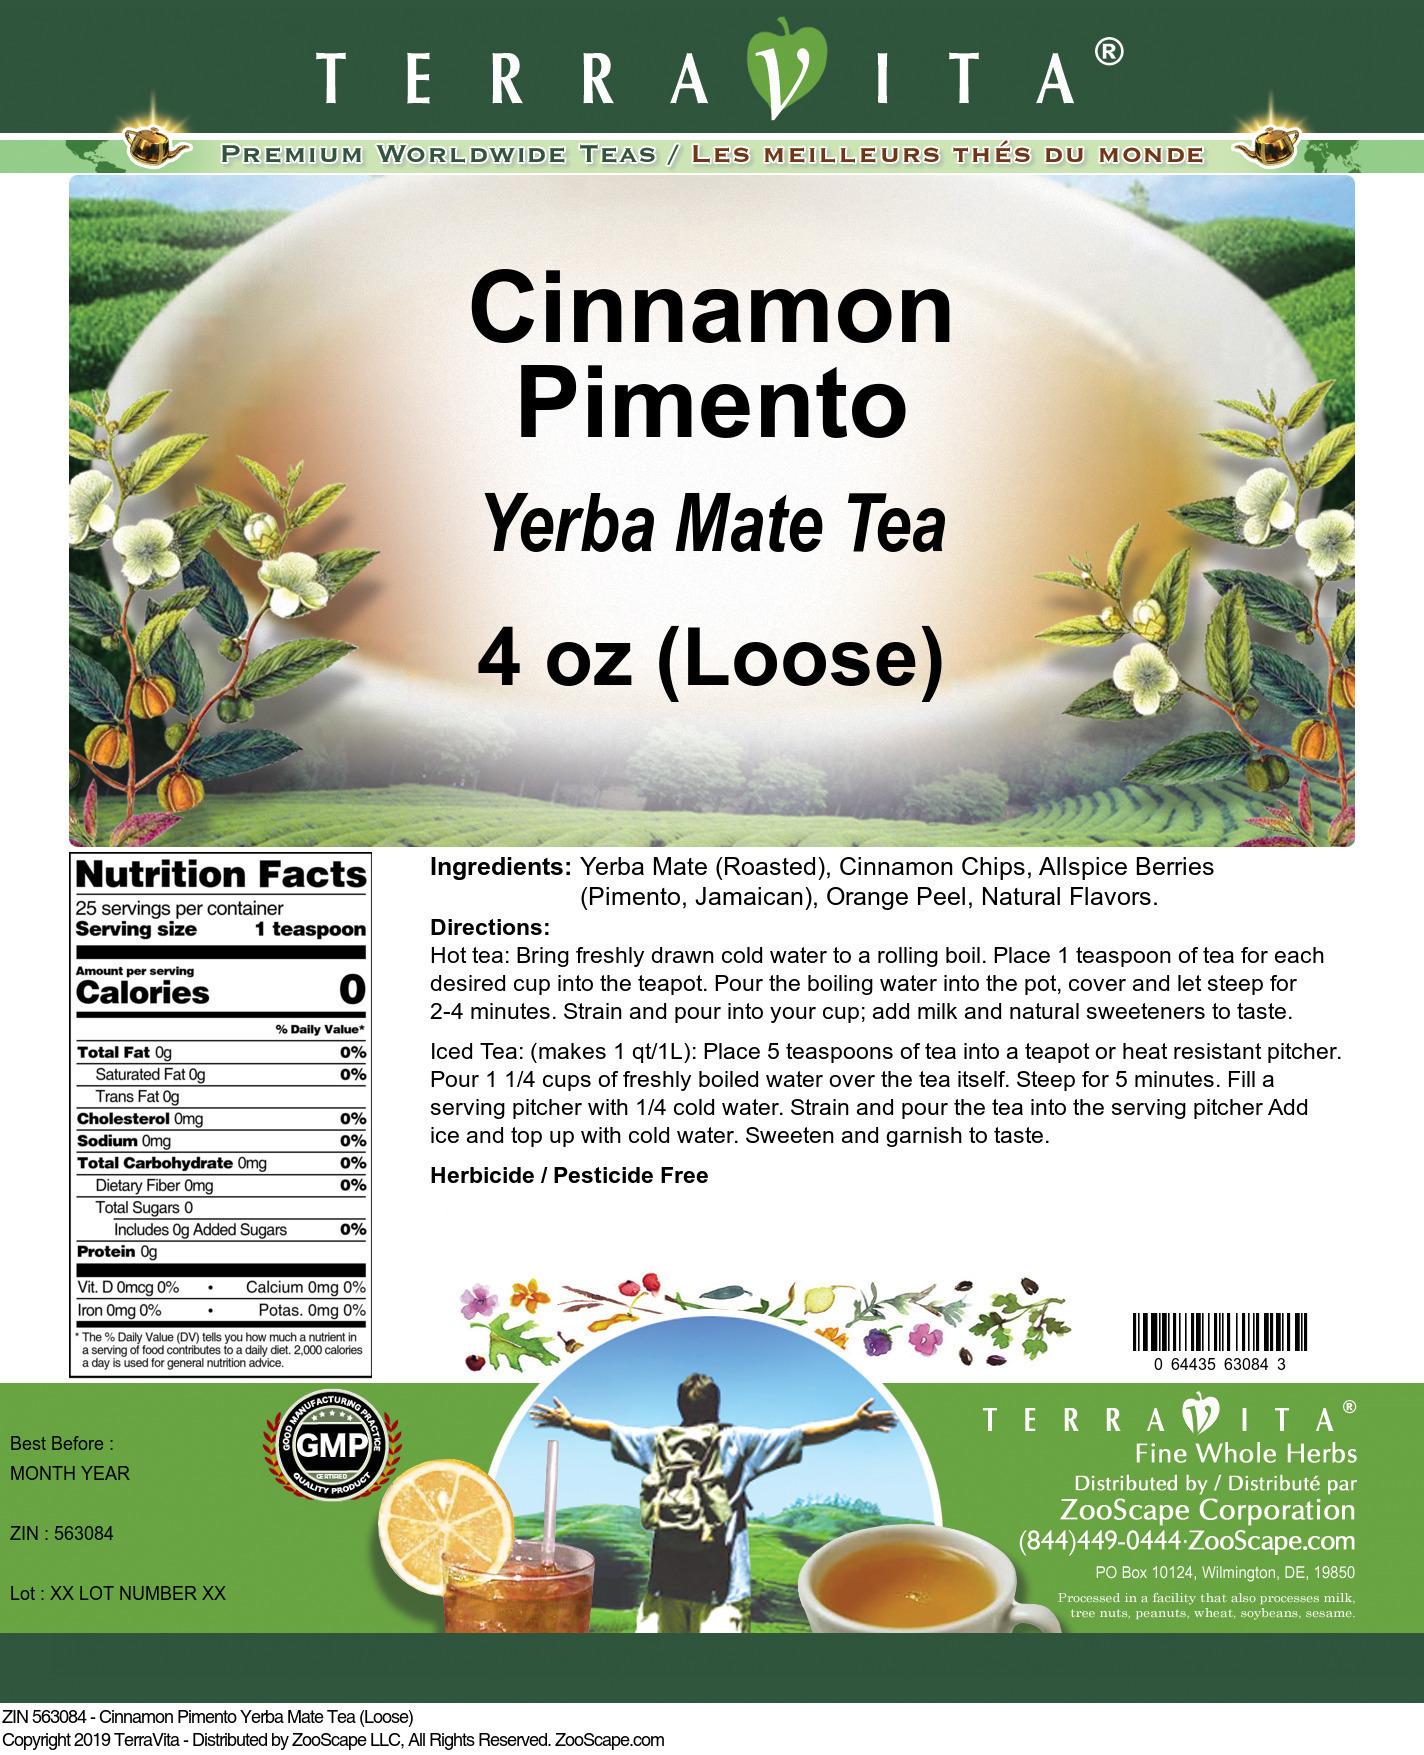 Cinnamon Pimento Yerba Mate